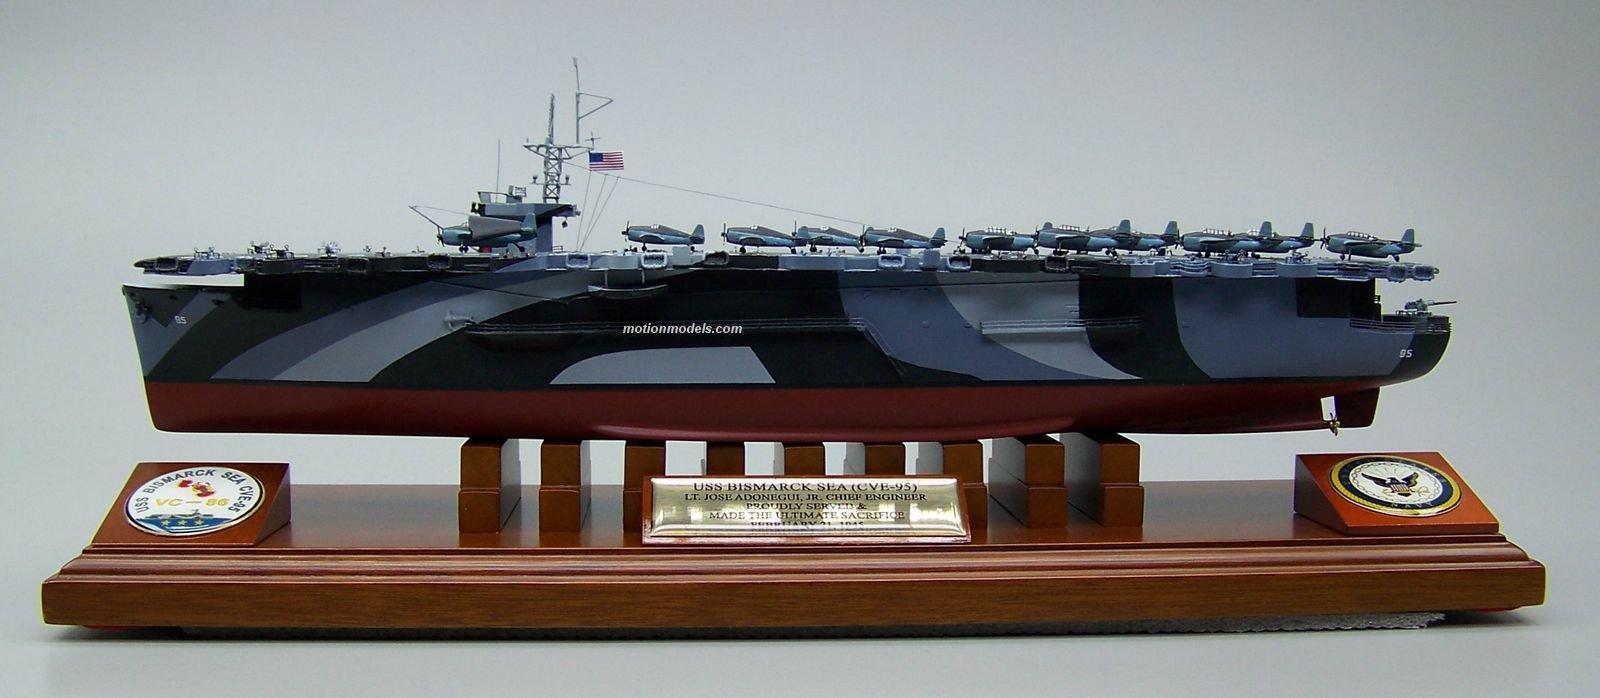 Ɂ�唐使图片 百度百科 in addition Maki Horikita likewise Ű�白兔图册  gt  ȯ�条图片 moreover Nest Swing   HOME   Outdoor Pinterest also USS California Model. on 866 html